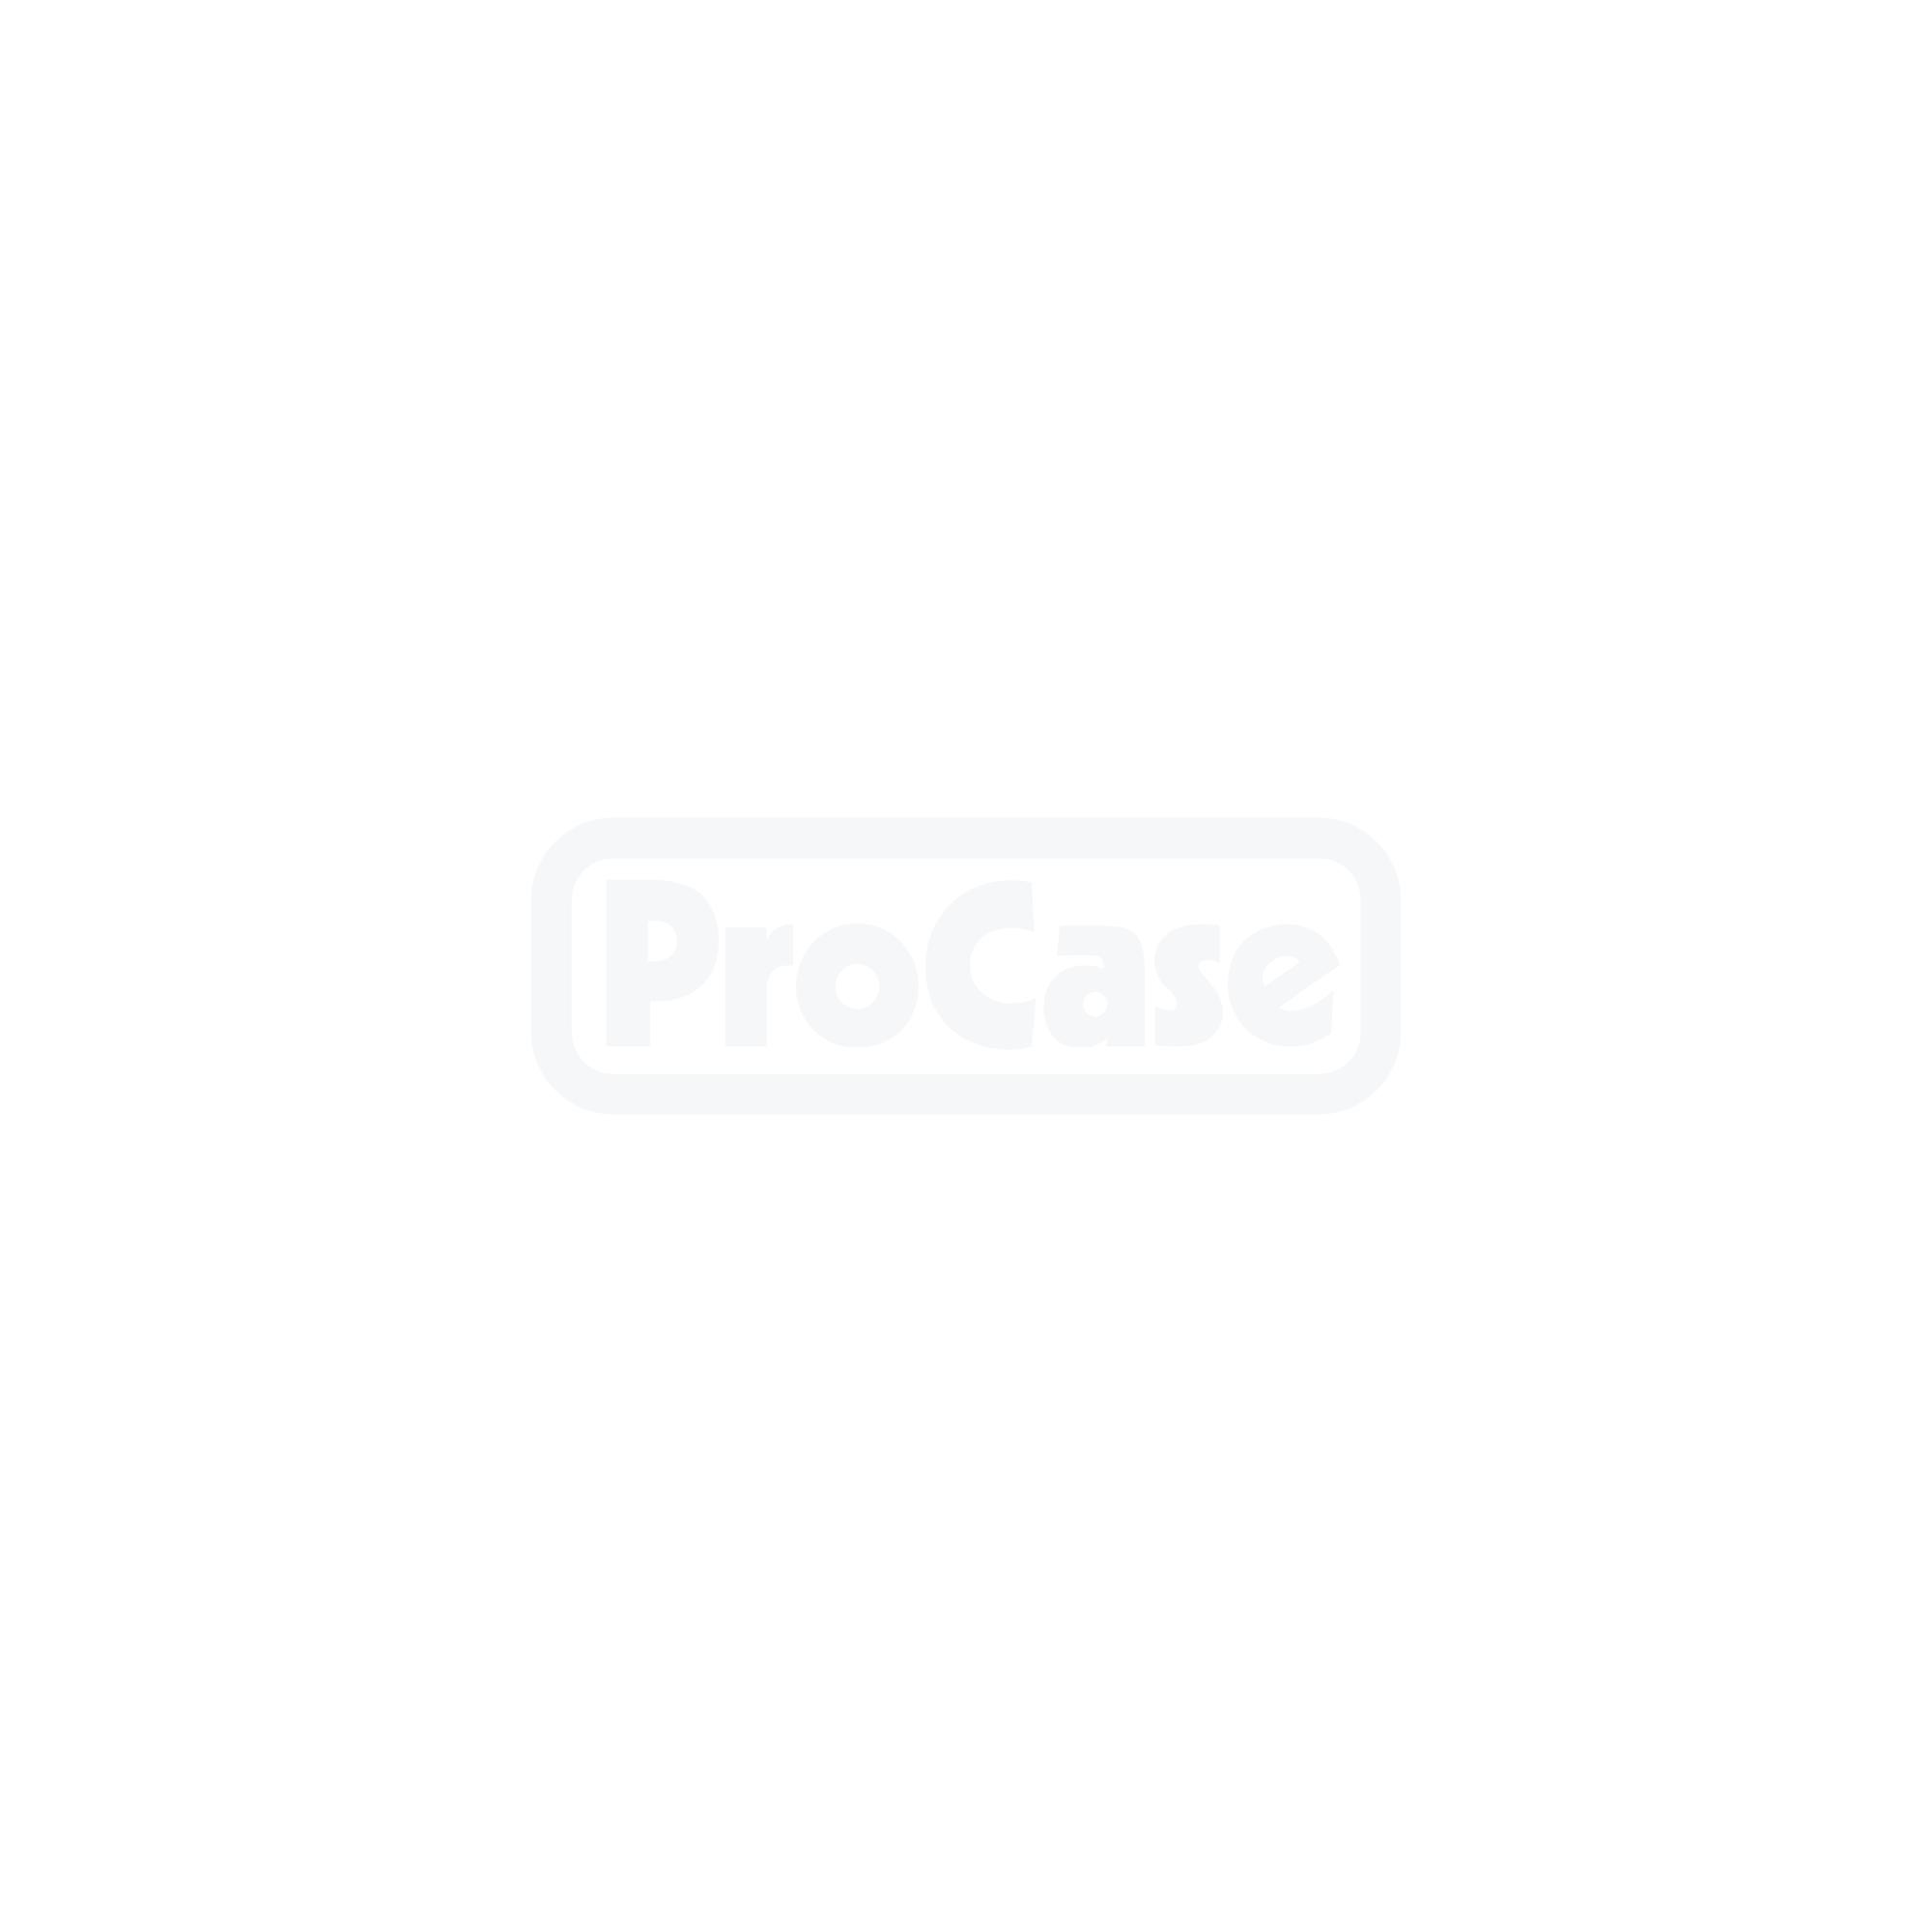 Flightcase für 2x Futurelight MH-660 Moving Head 2